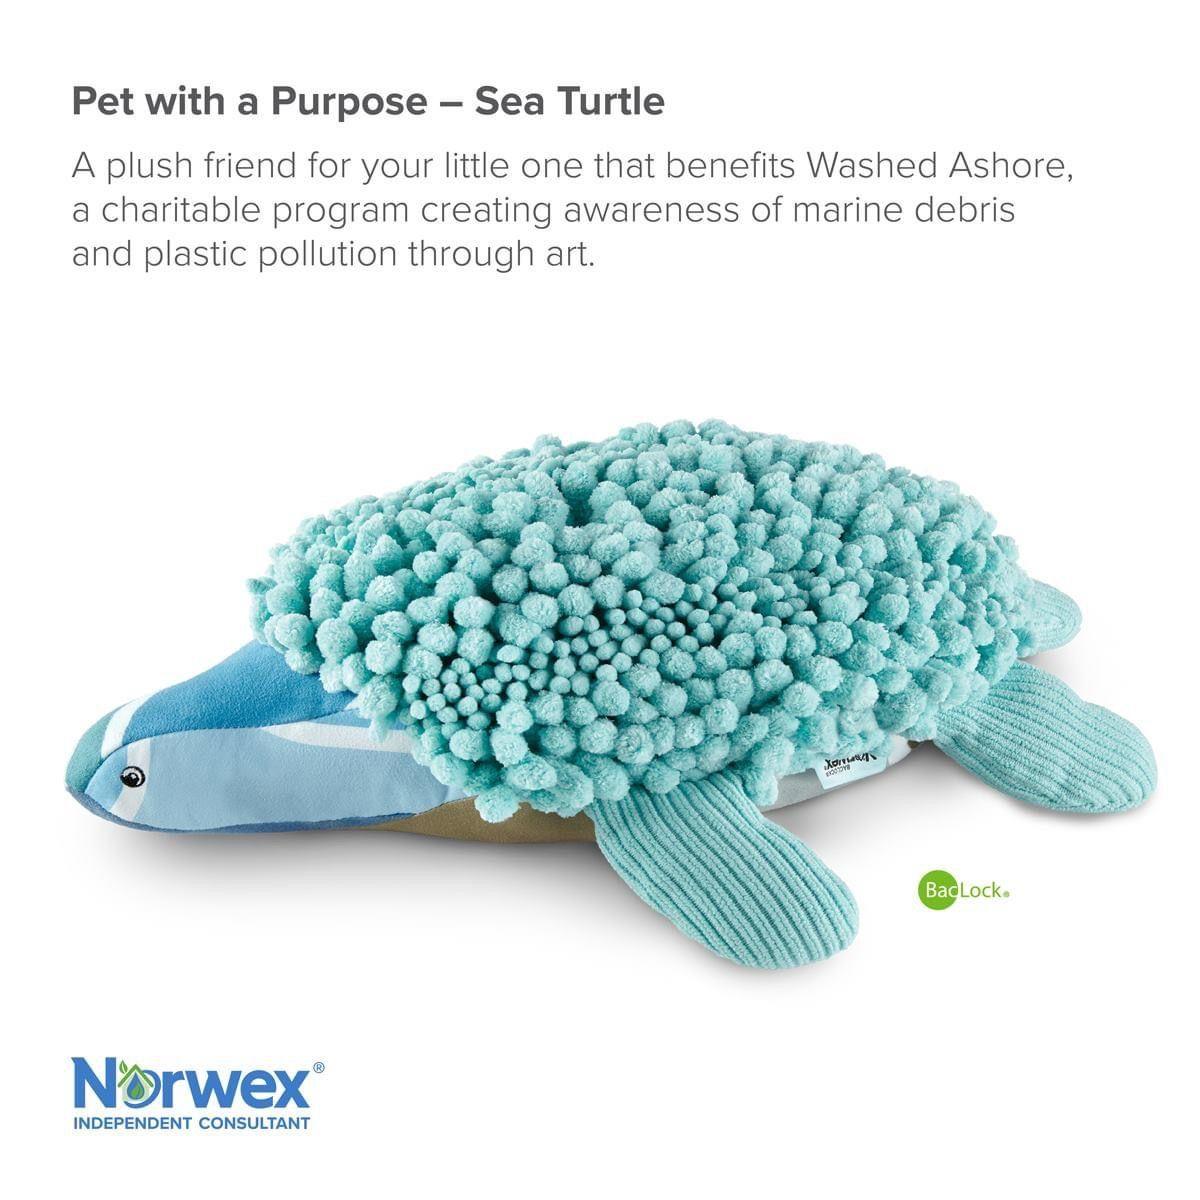 Adorable sea turtle sea turtle norwex fluffy stuffed